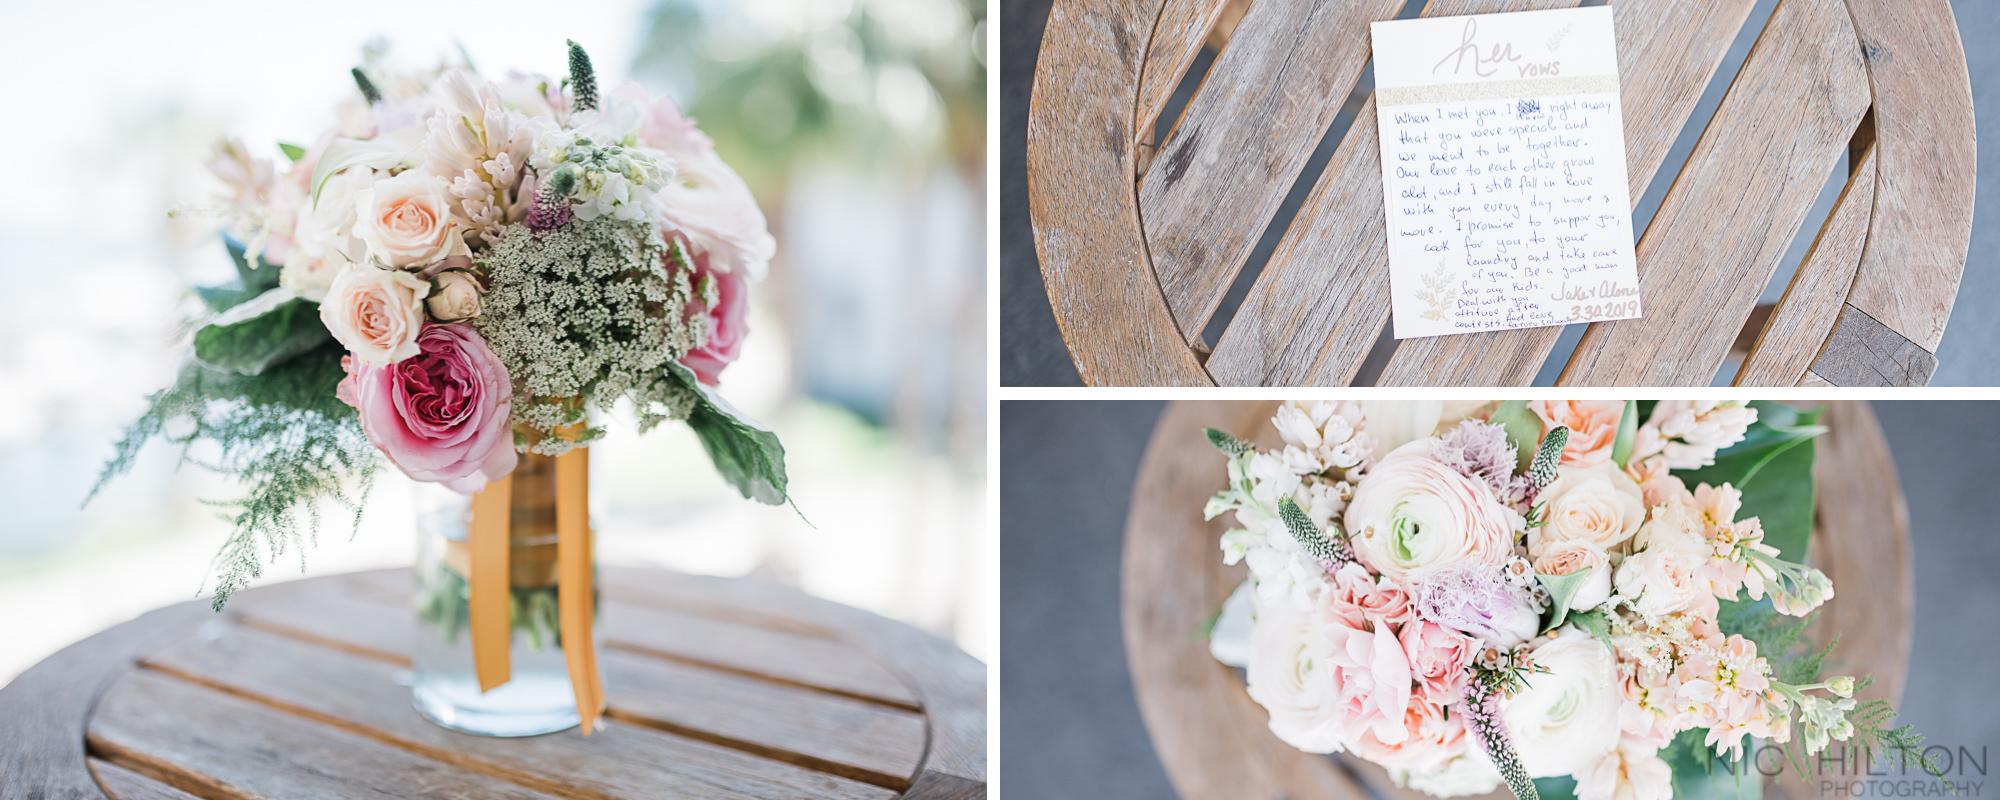 Bride-Florals-Hotel-Maya-Wedding.jpg